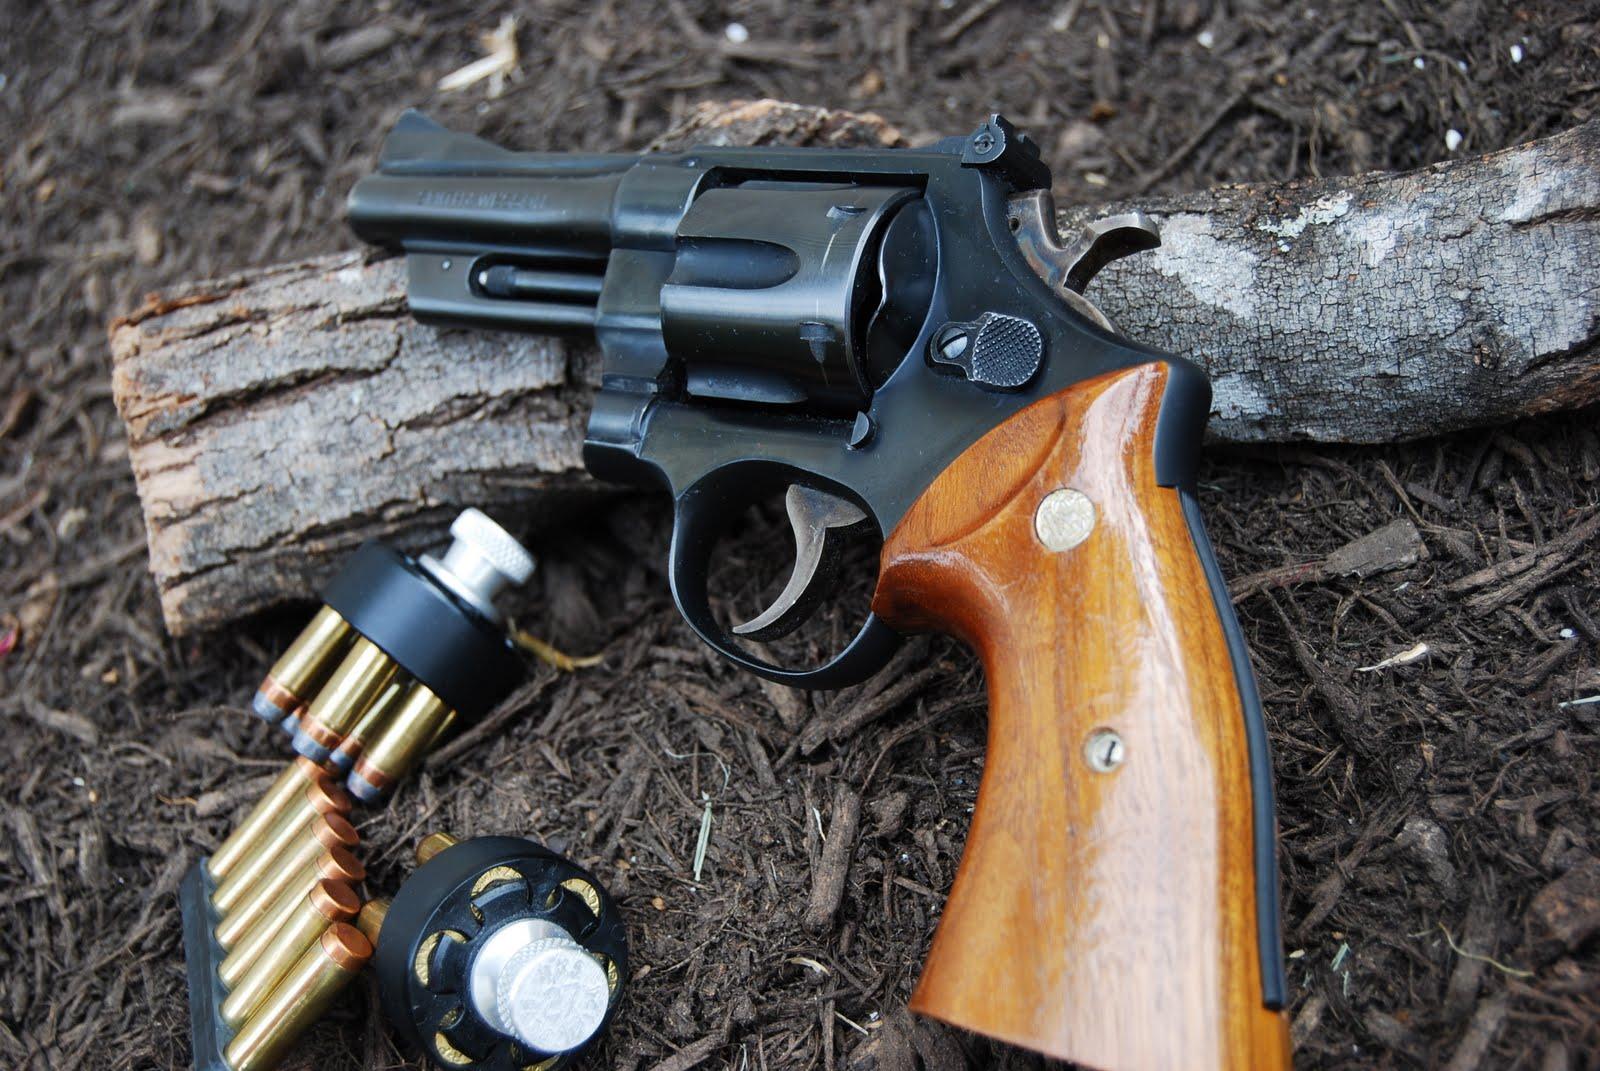 GUN PORN by codenamesilentg on DeviantArt